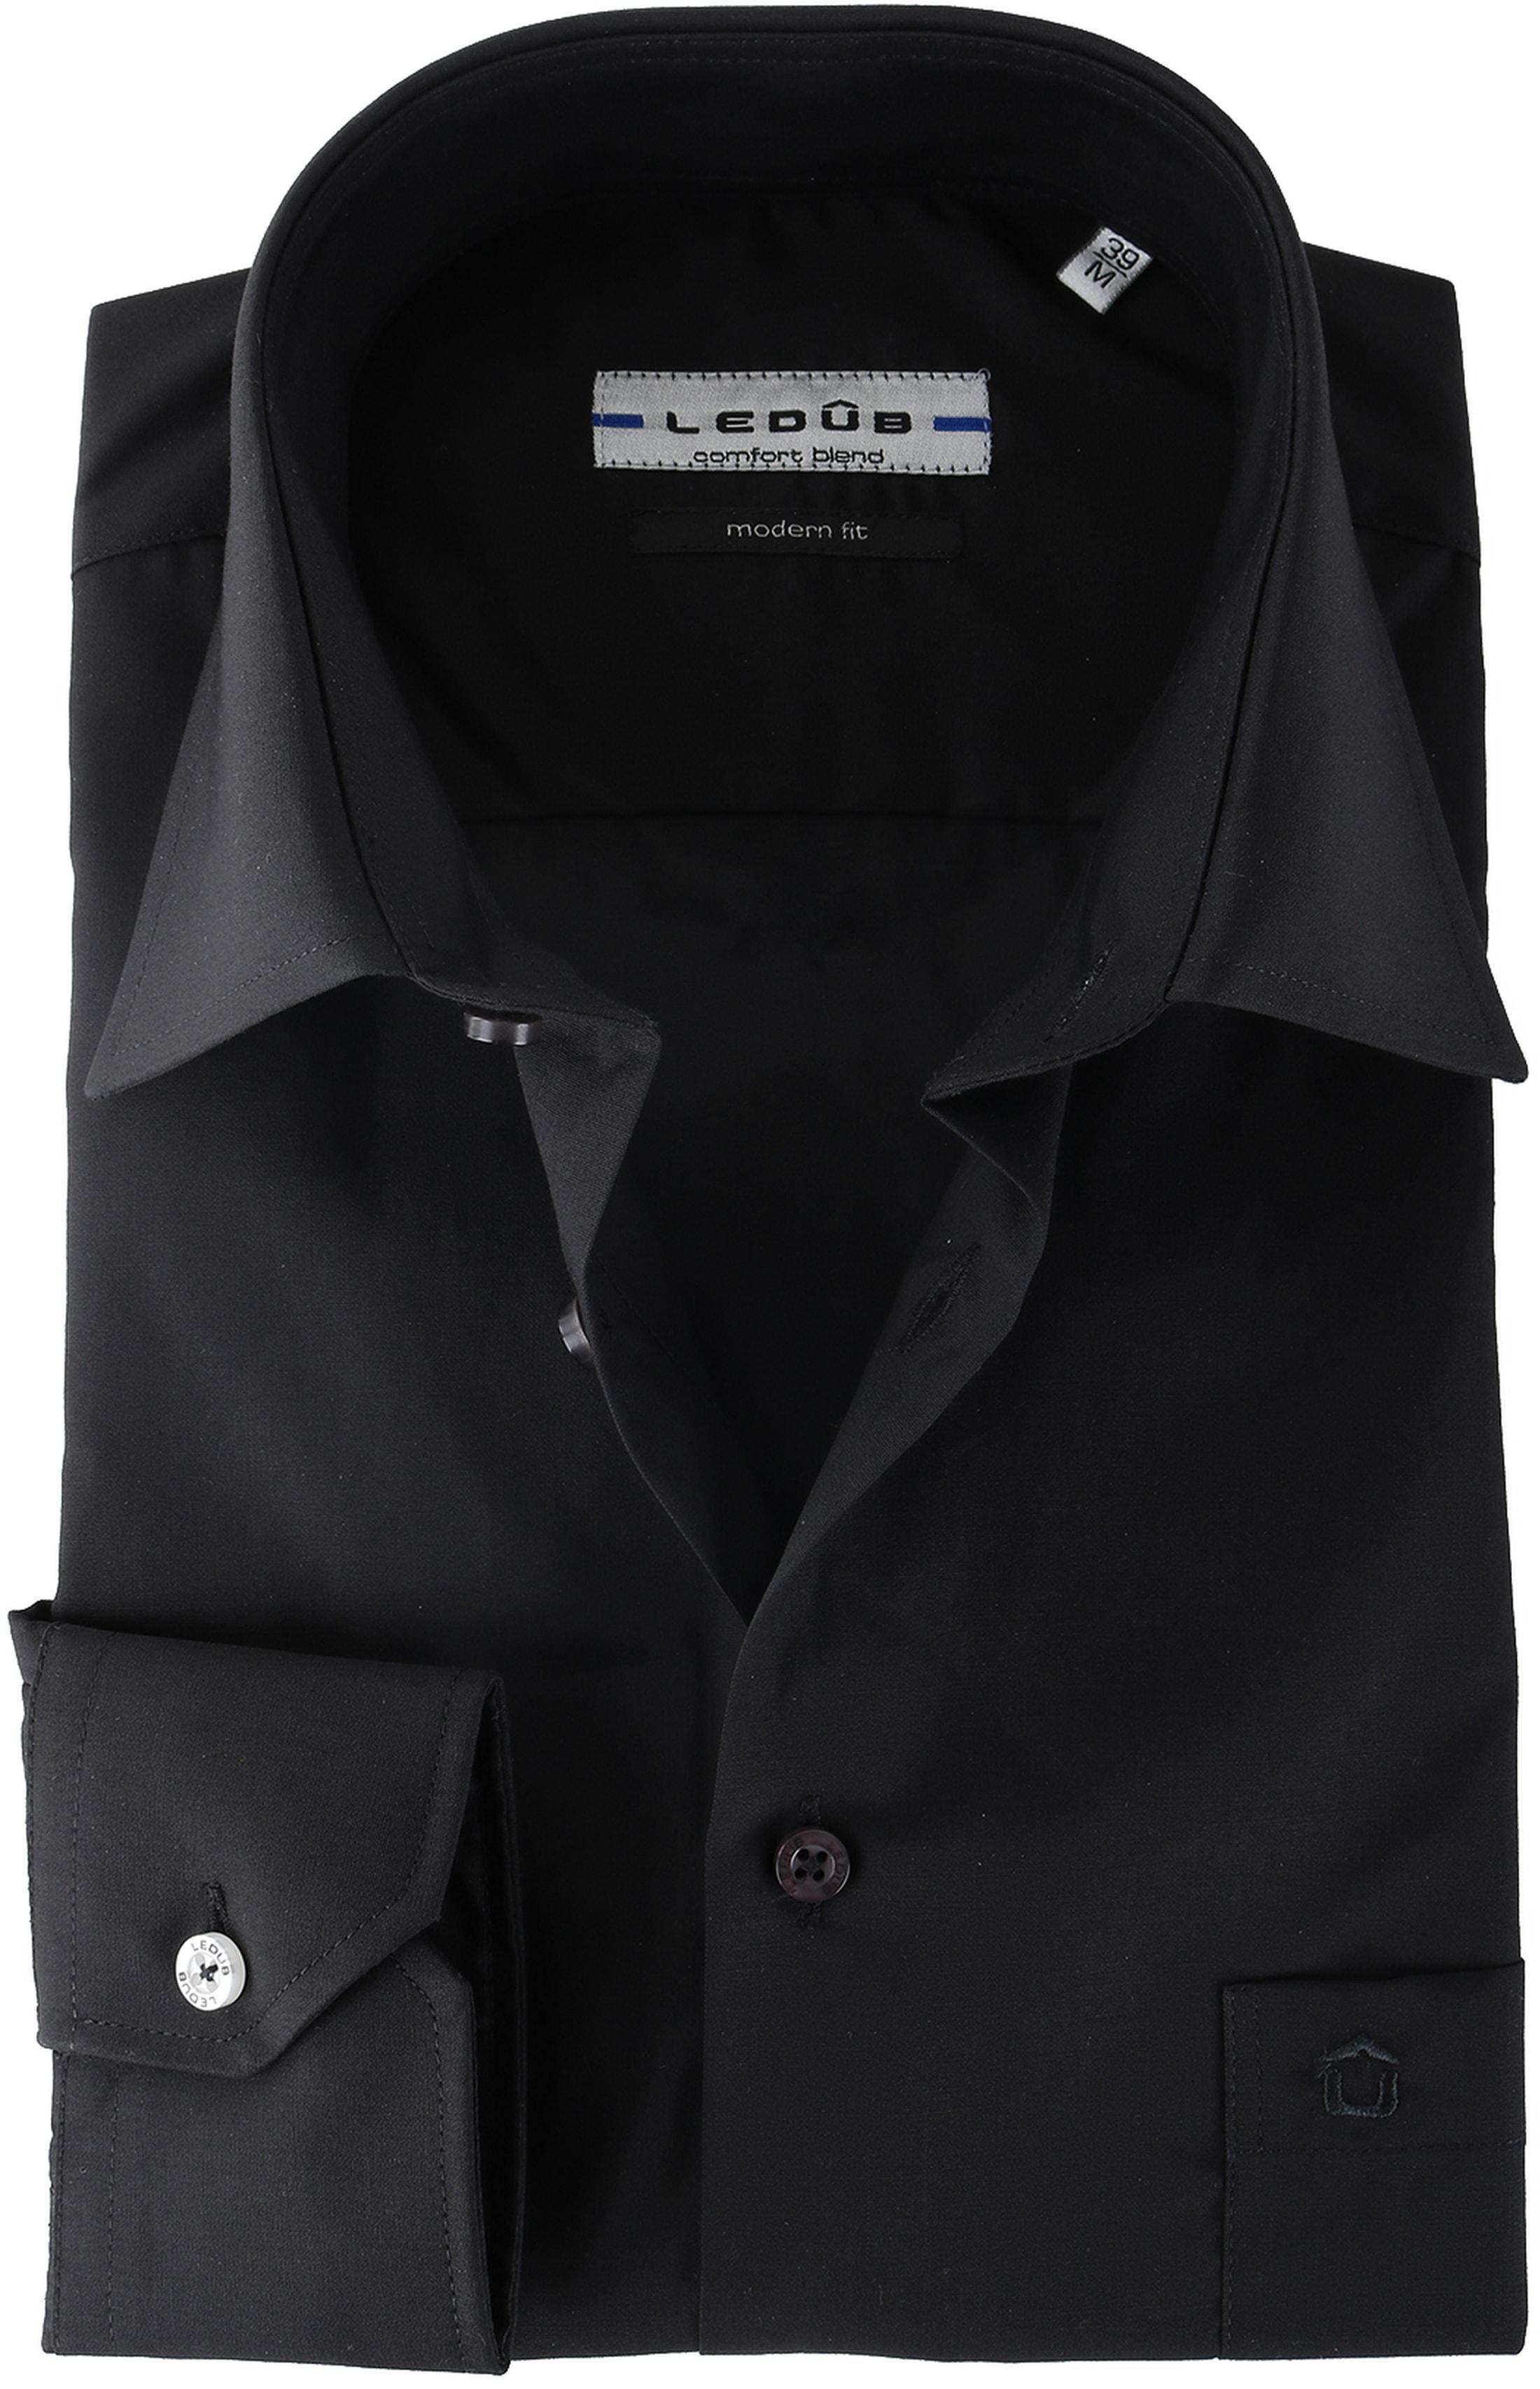 Ledub Hemd Zwart Modern Fit